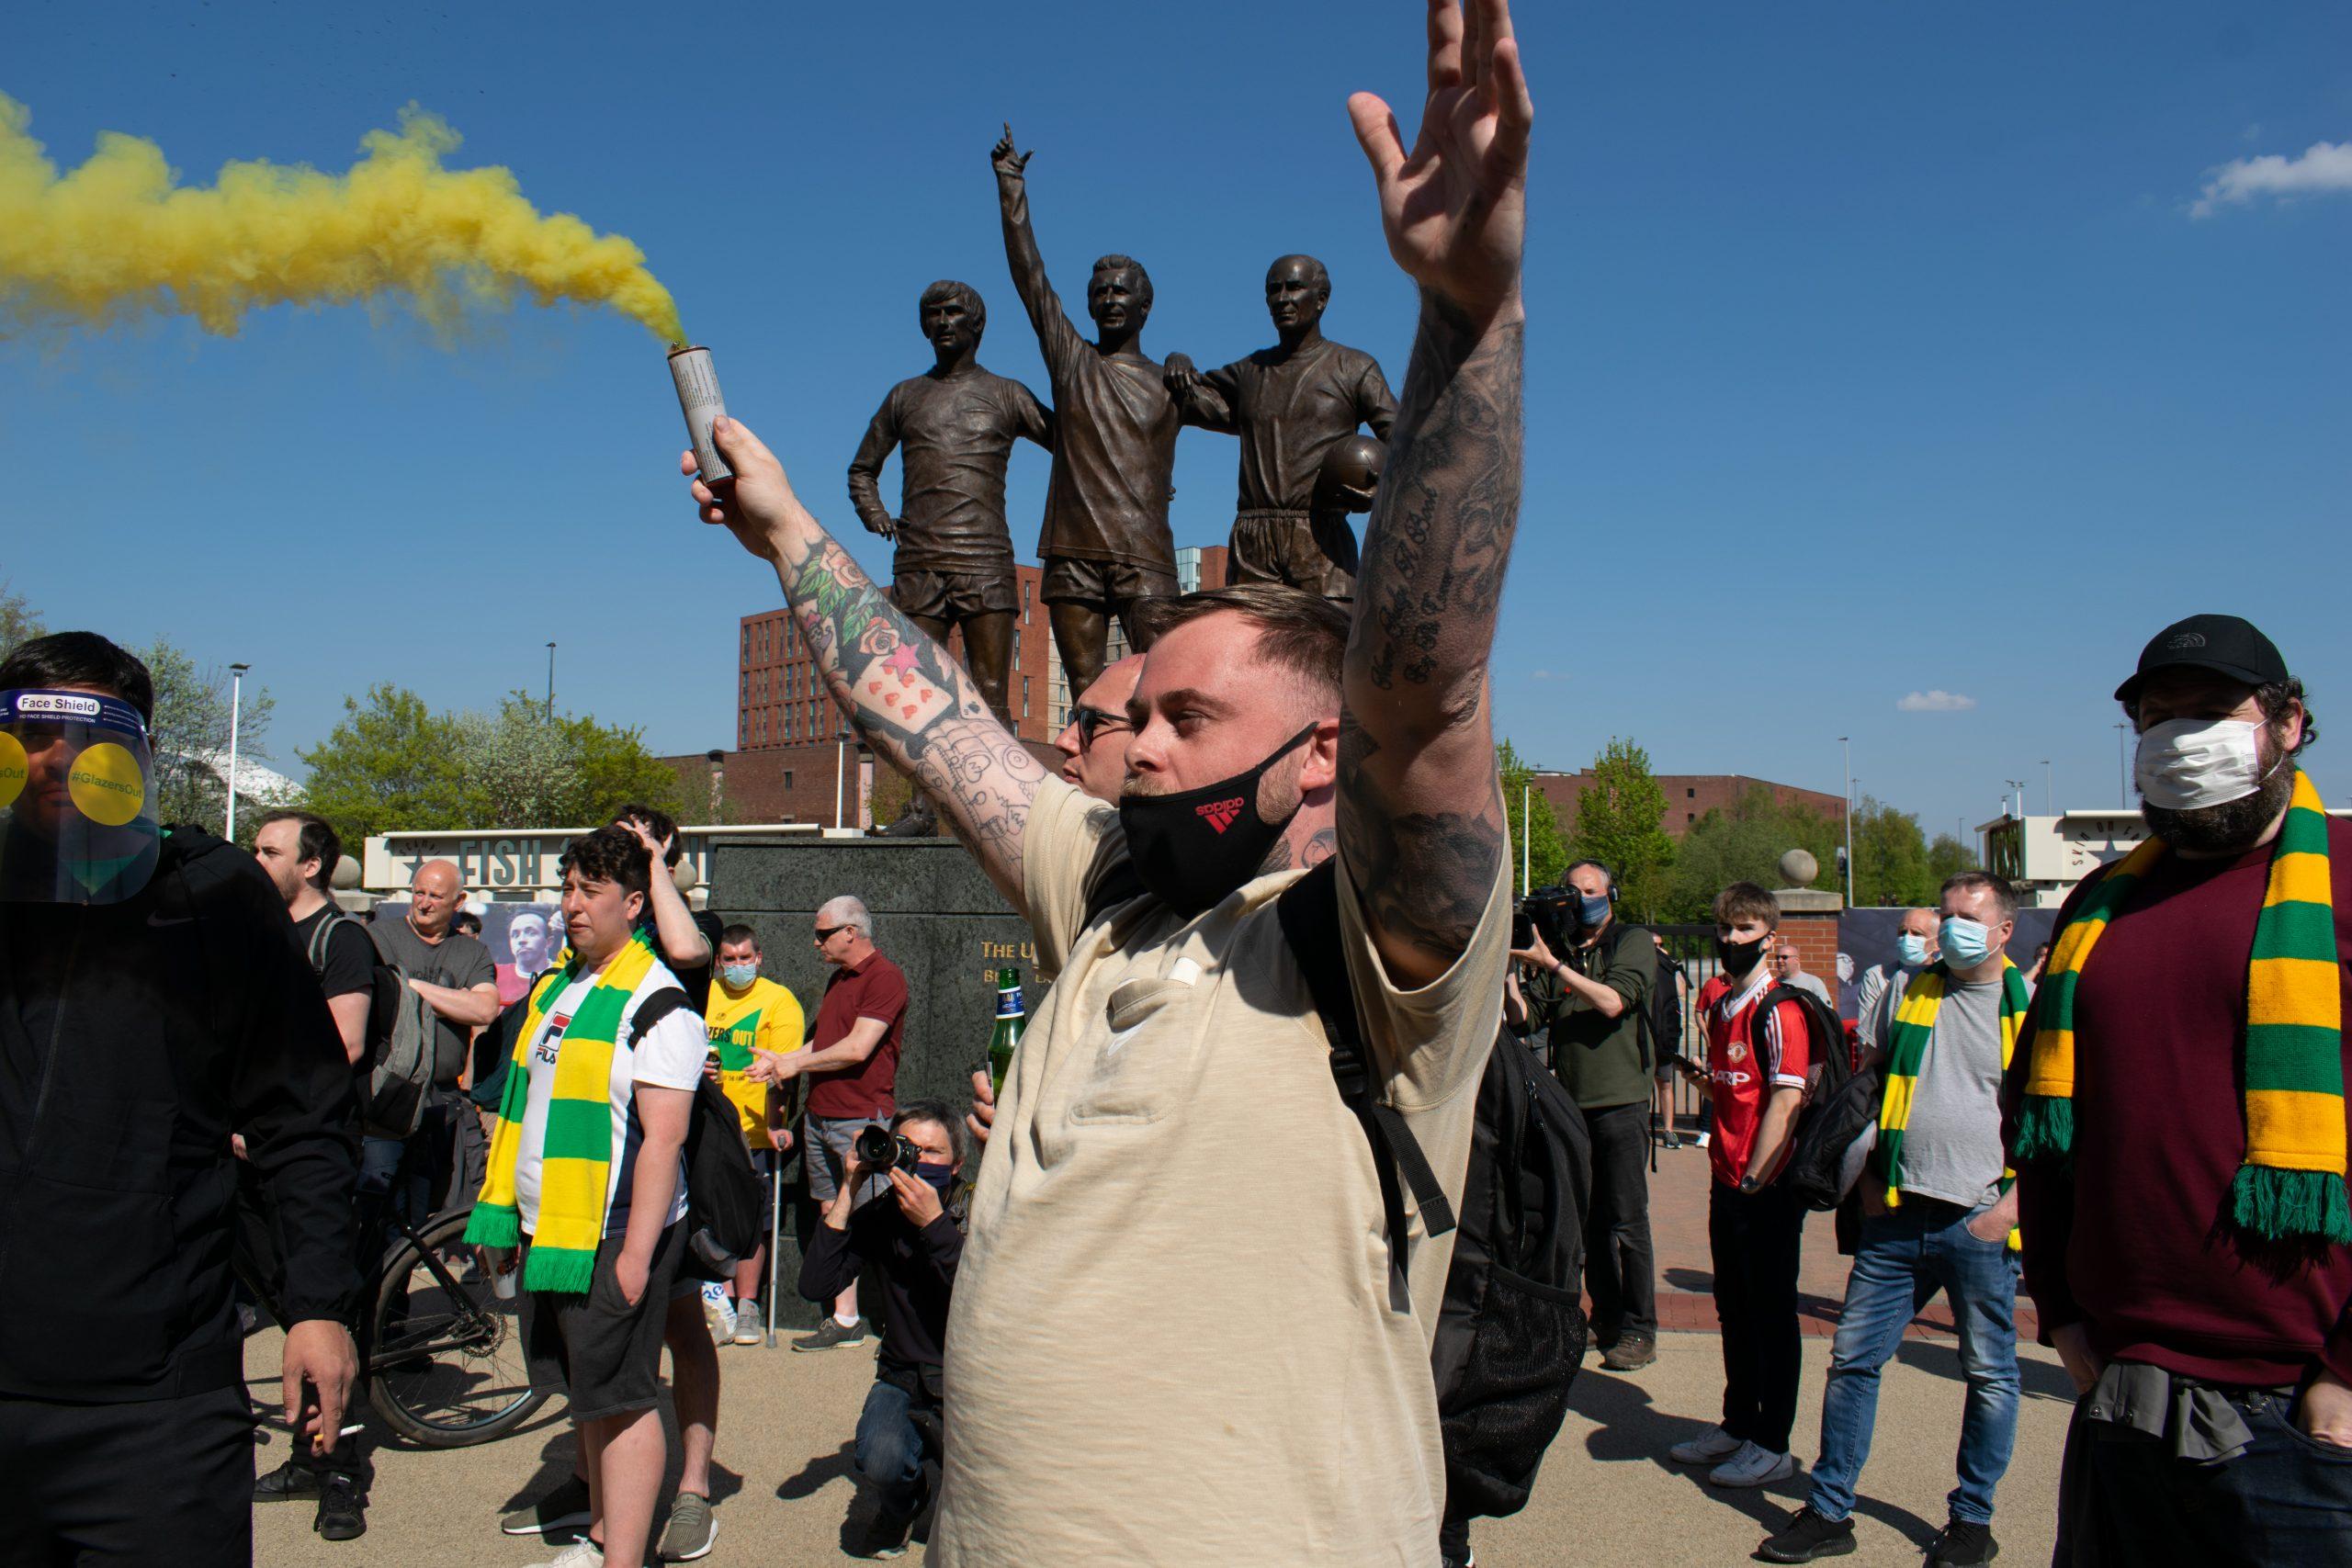 Protestors at Old Trafford Sports Stadium